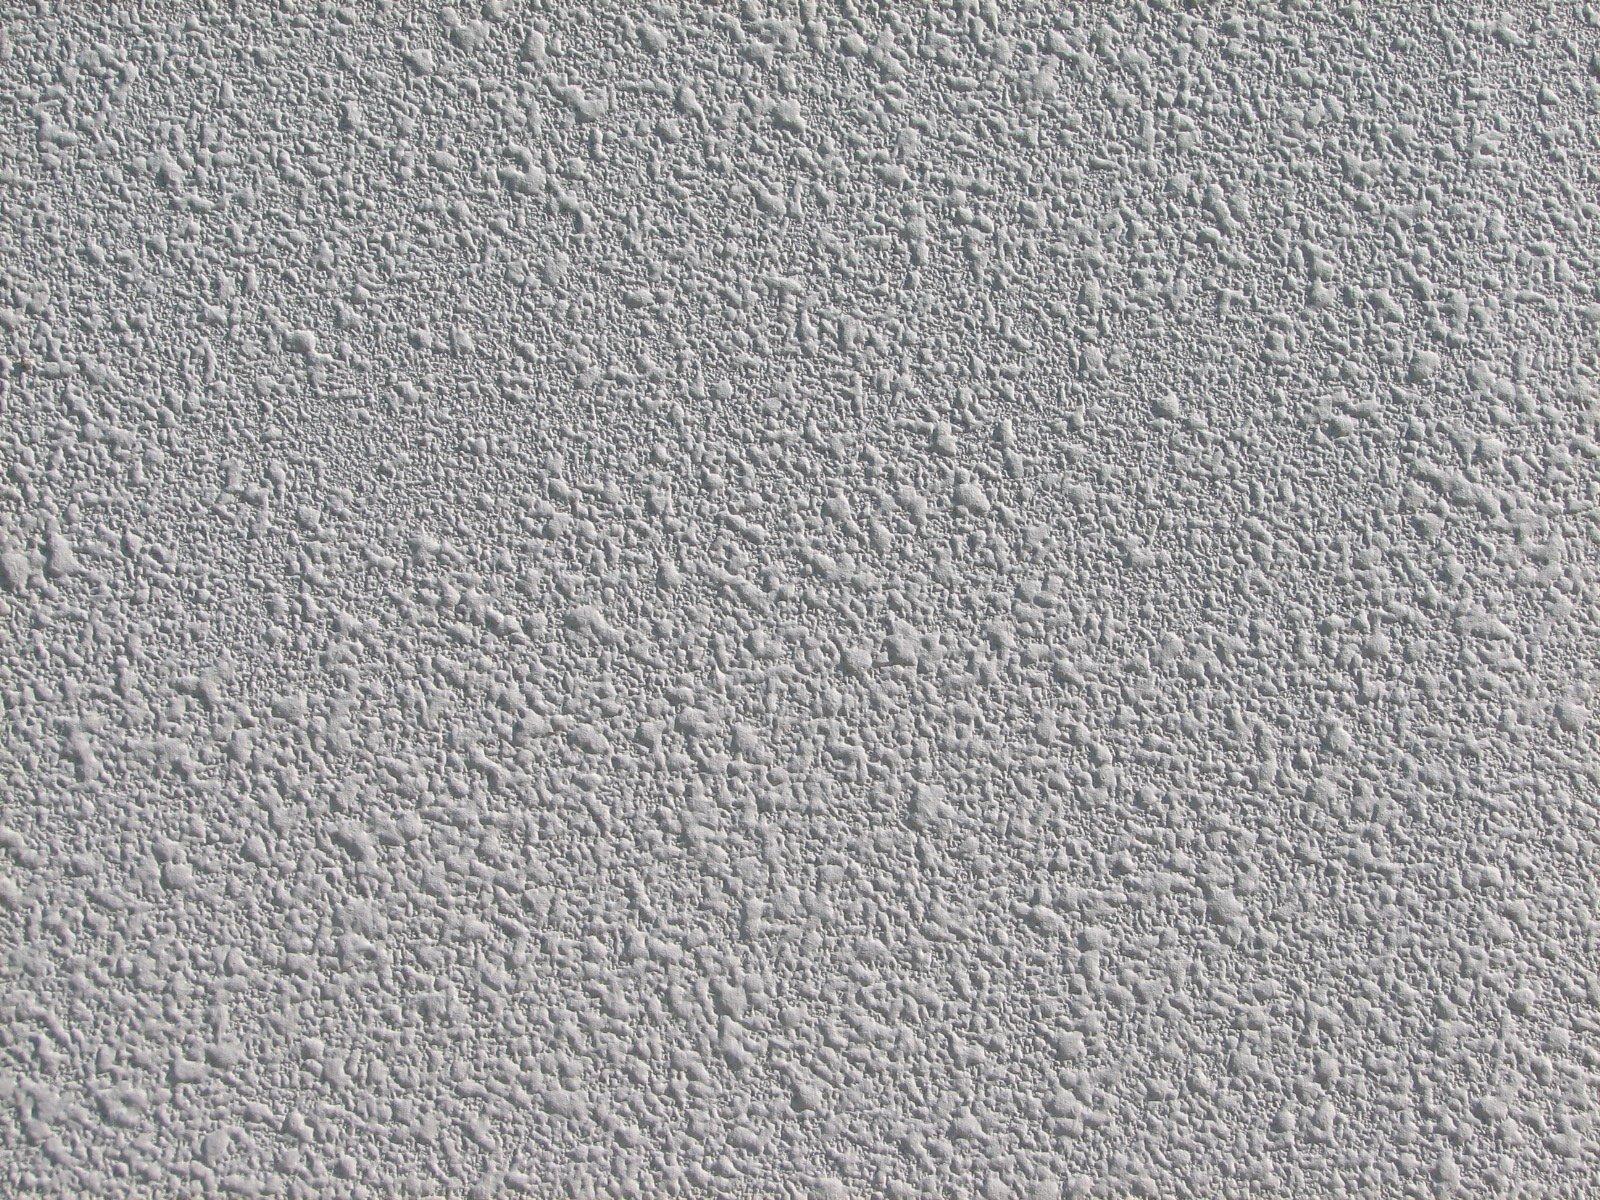 ceiling texture, splatter texture, ceilings, gallery